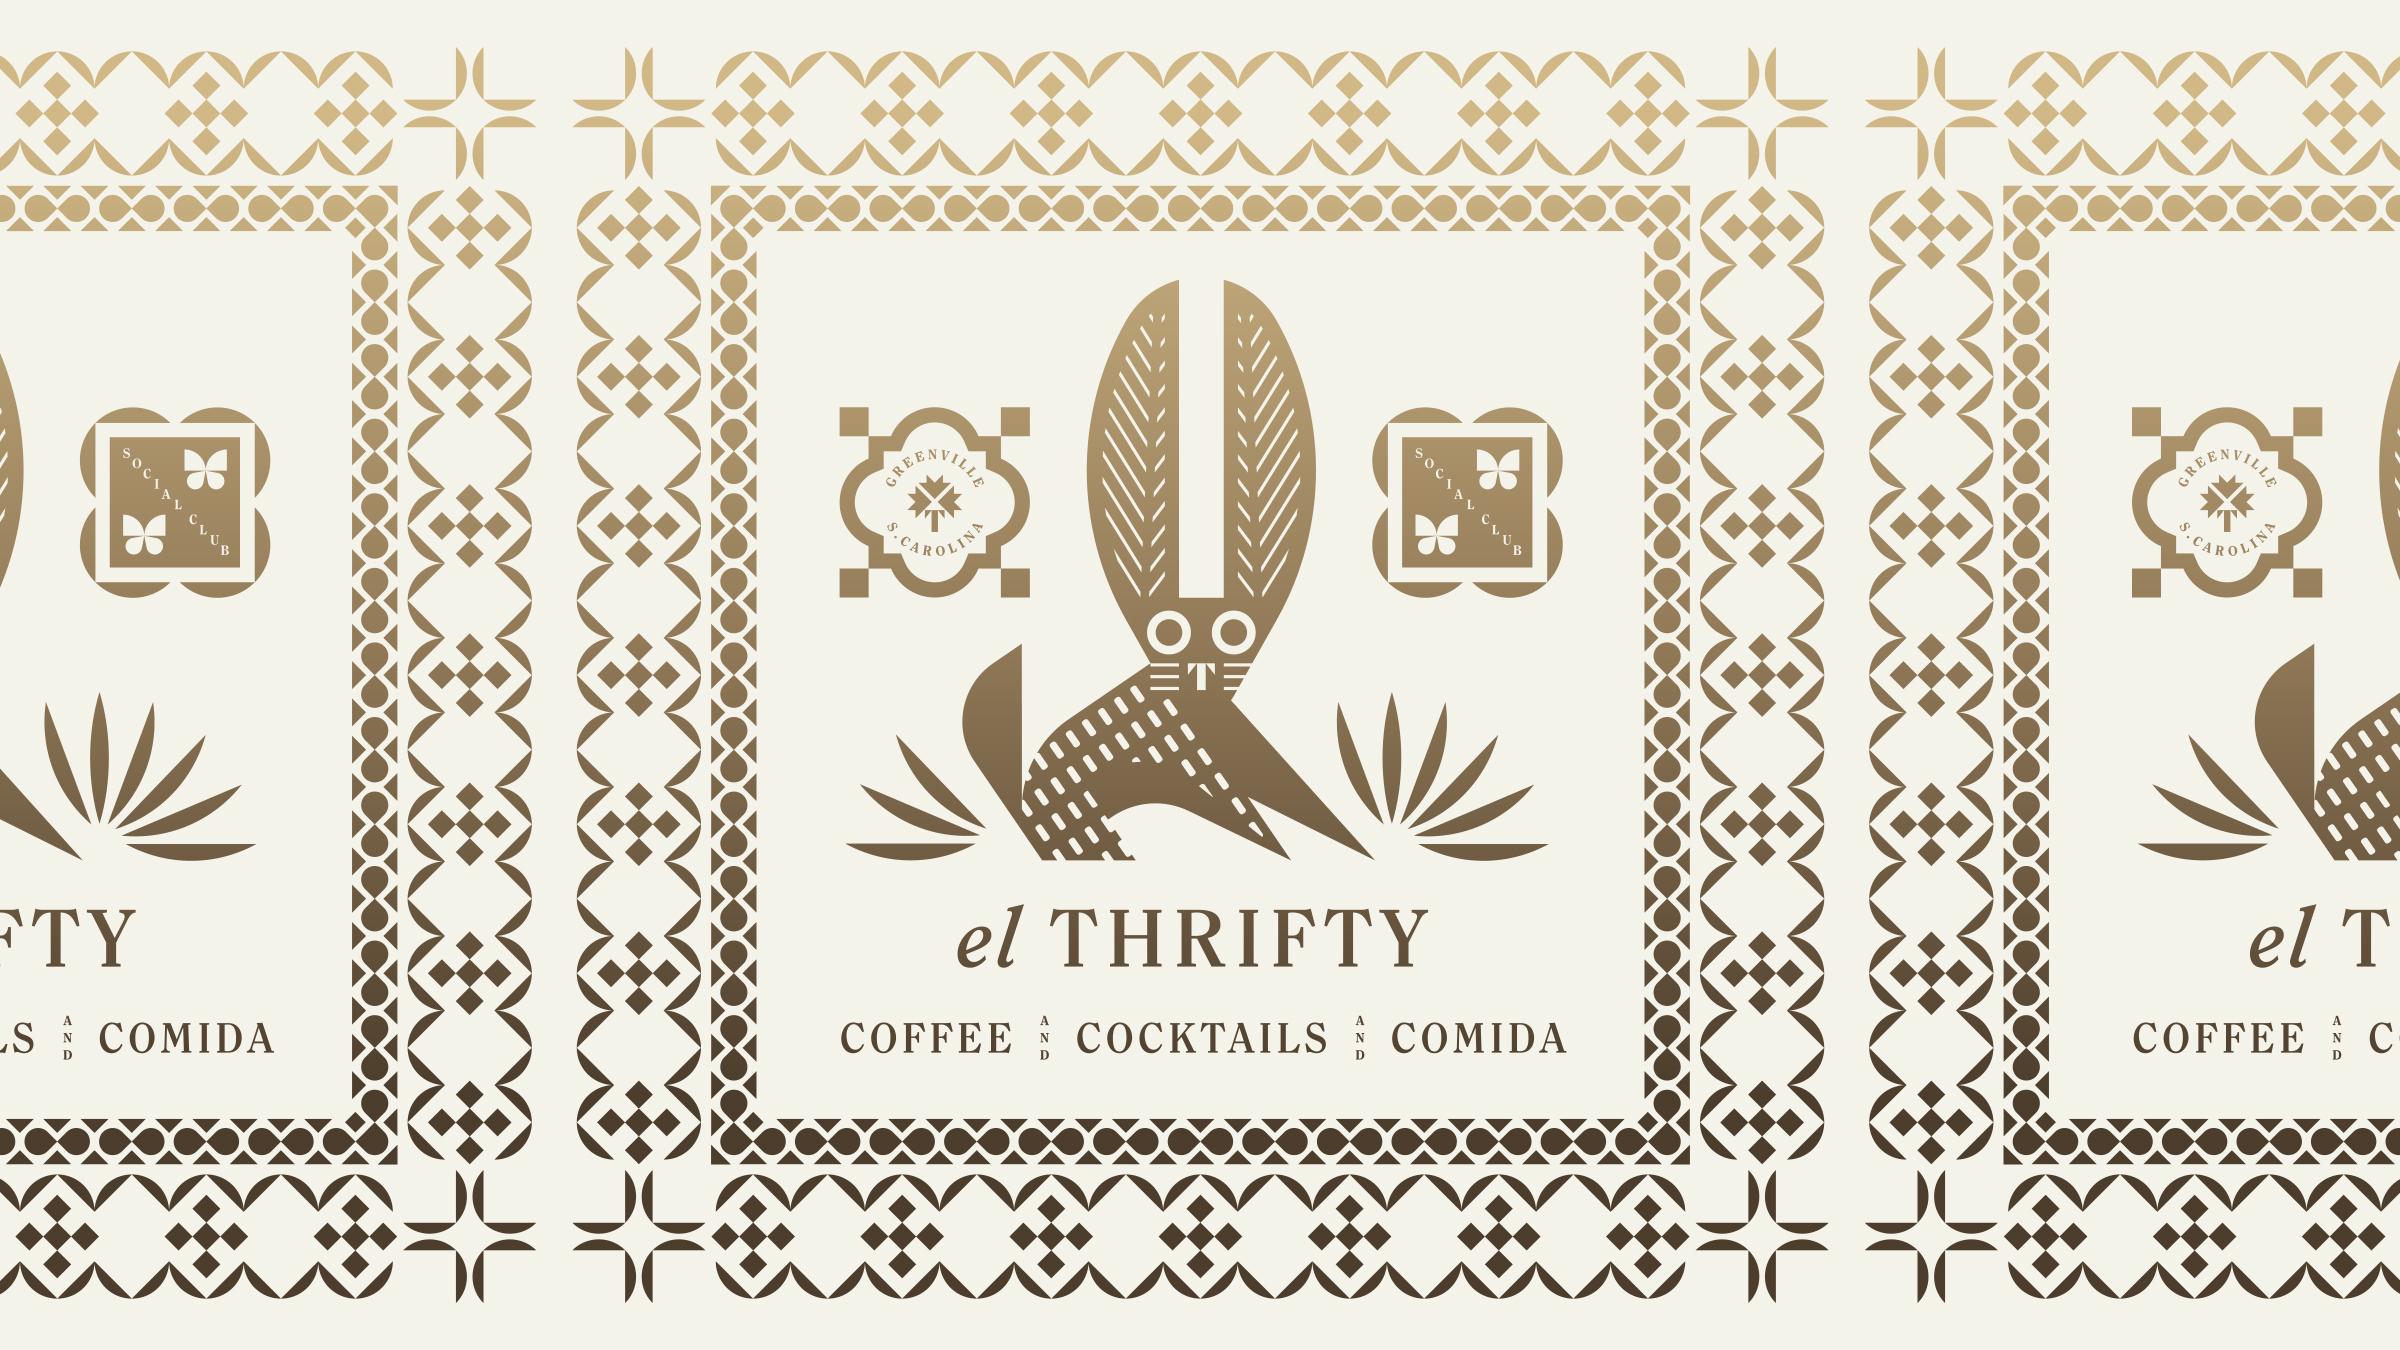 El Thrifty Restaurant Coffee Cocktails Comida